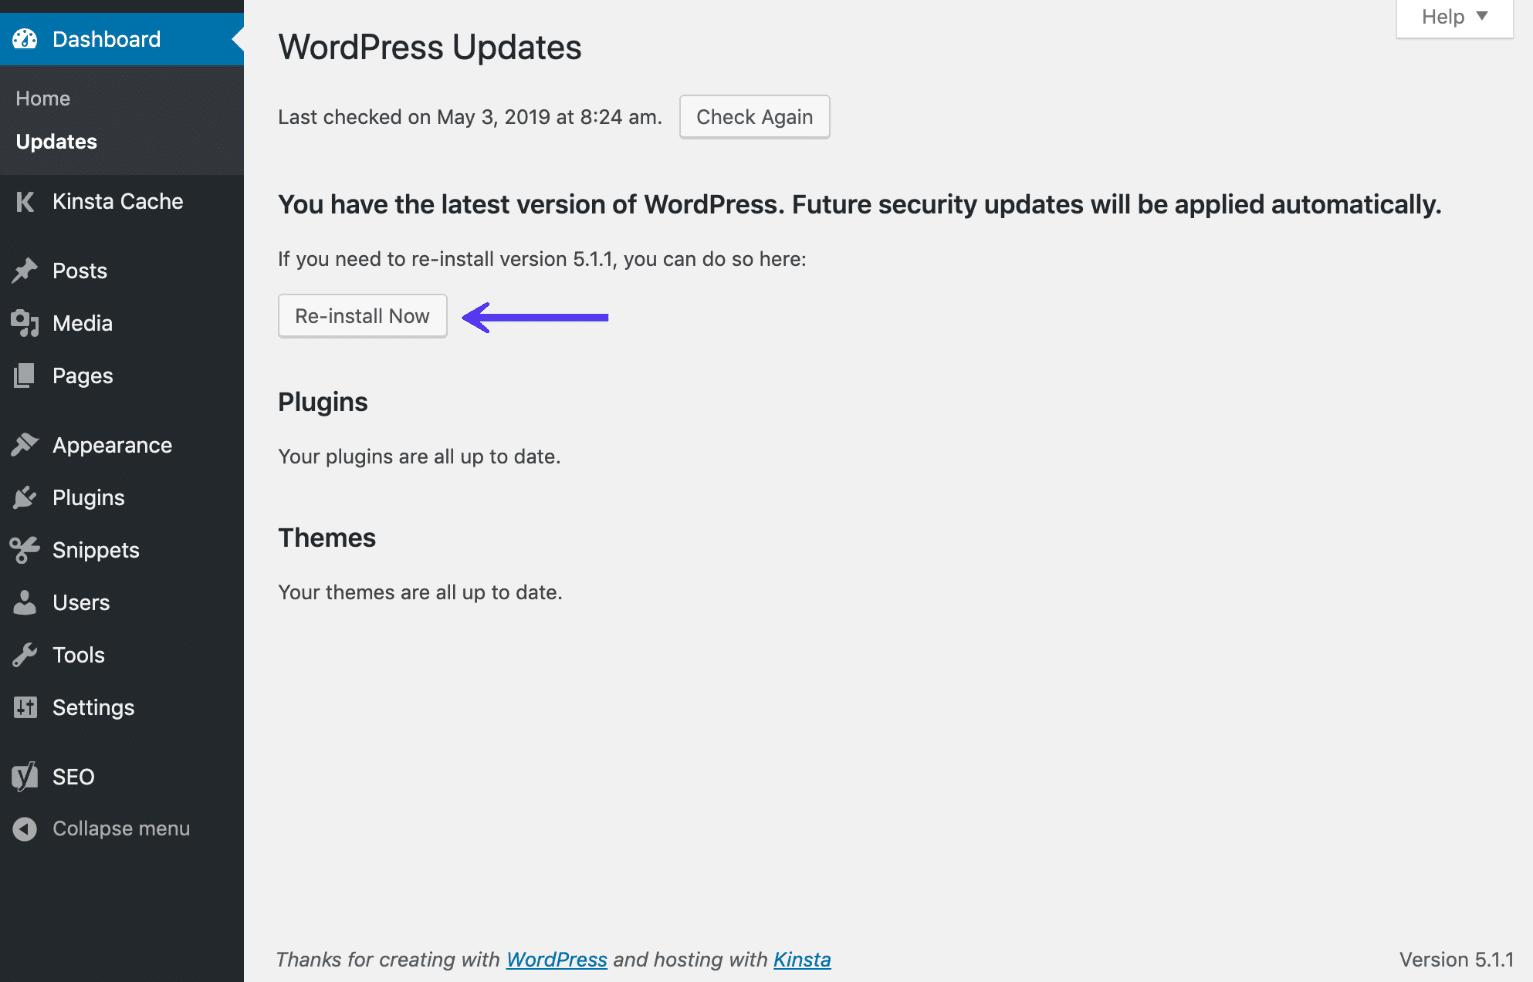 WordPressダッシュボードの「今すぐ再インストール」オプション